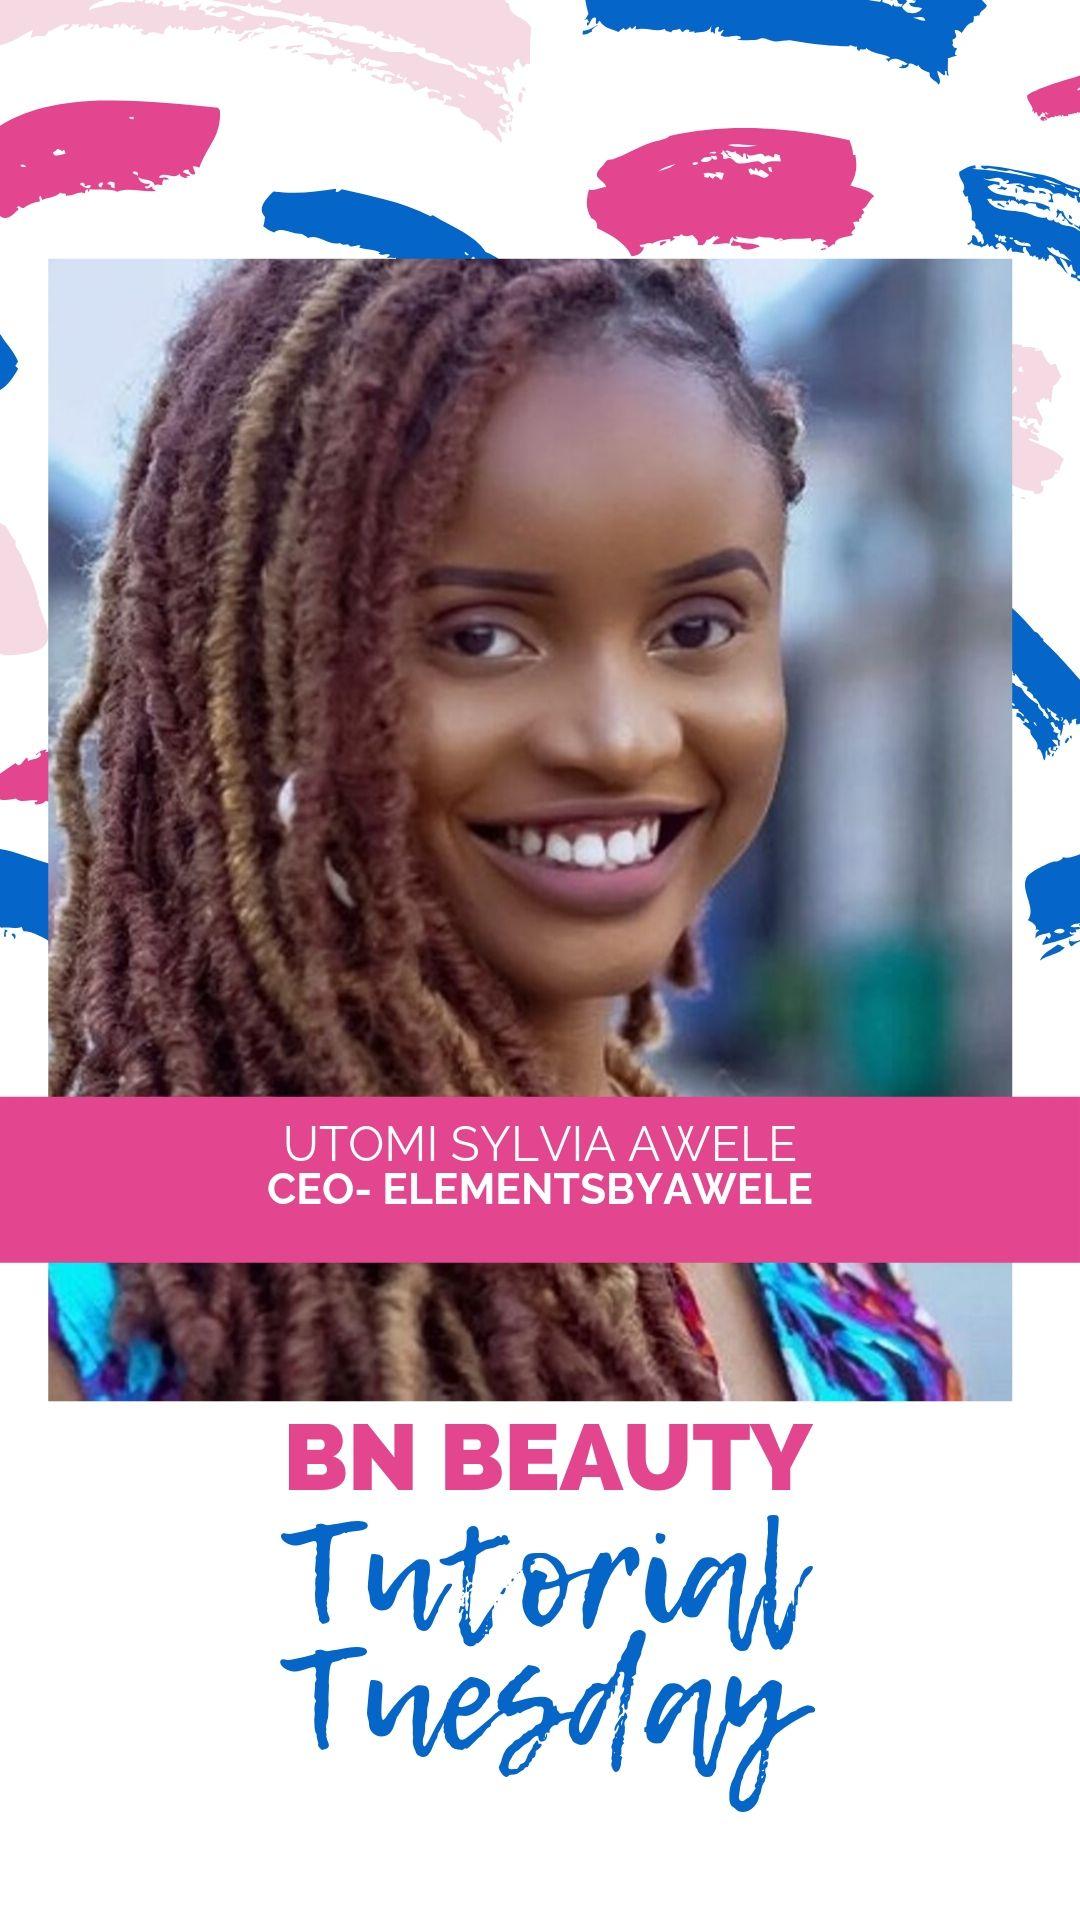 #BNBeautyTutorialTuesday 1 | Utomi Sylvia Awele